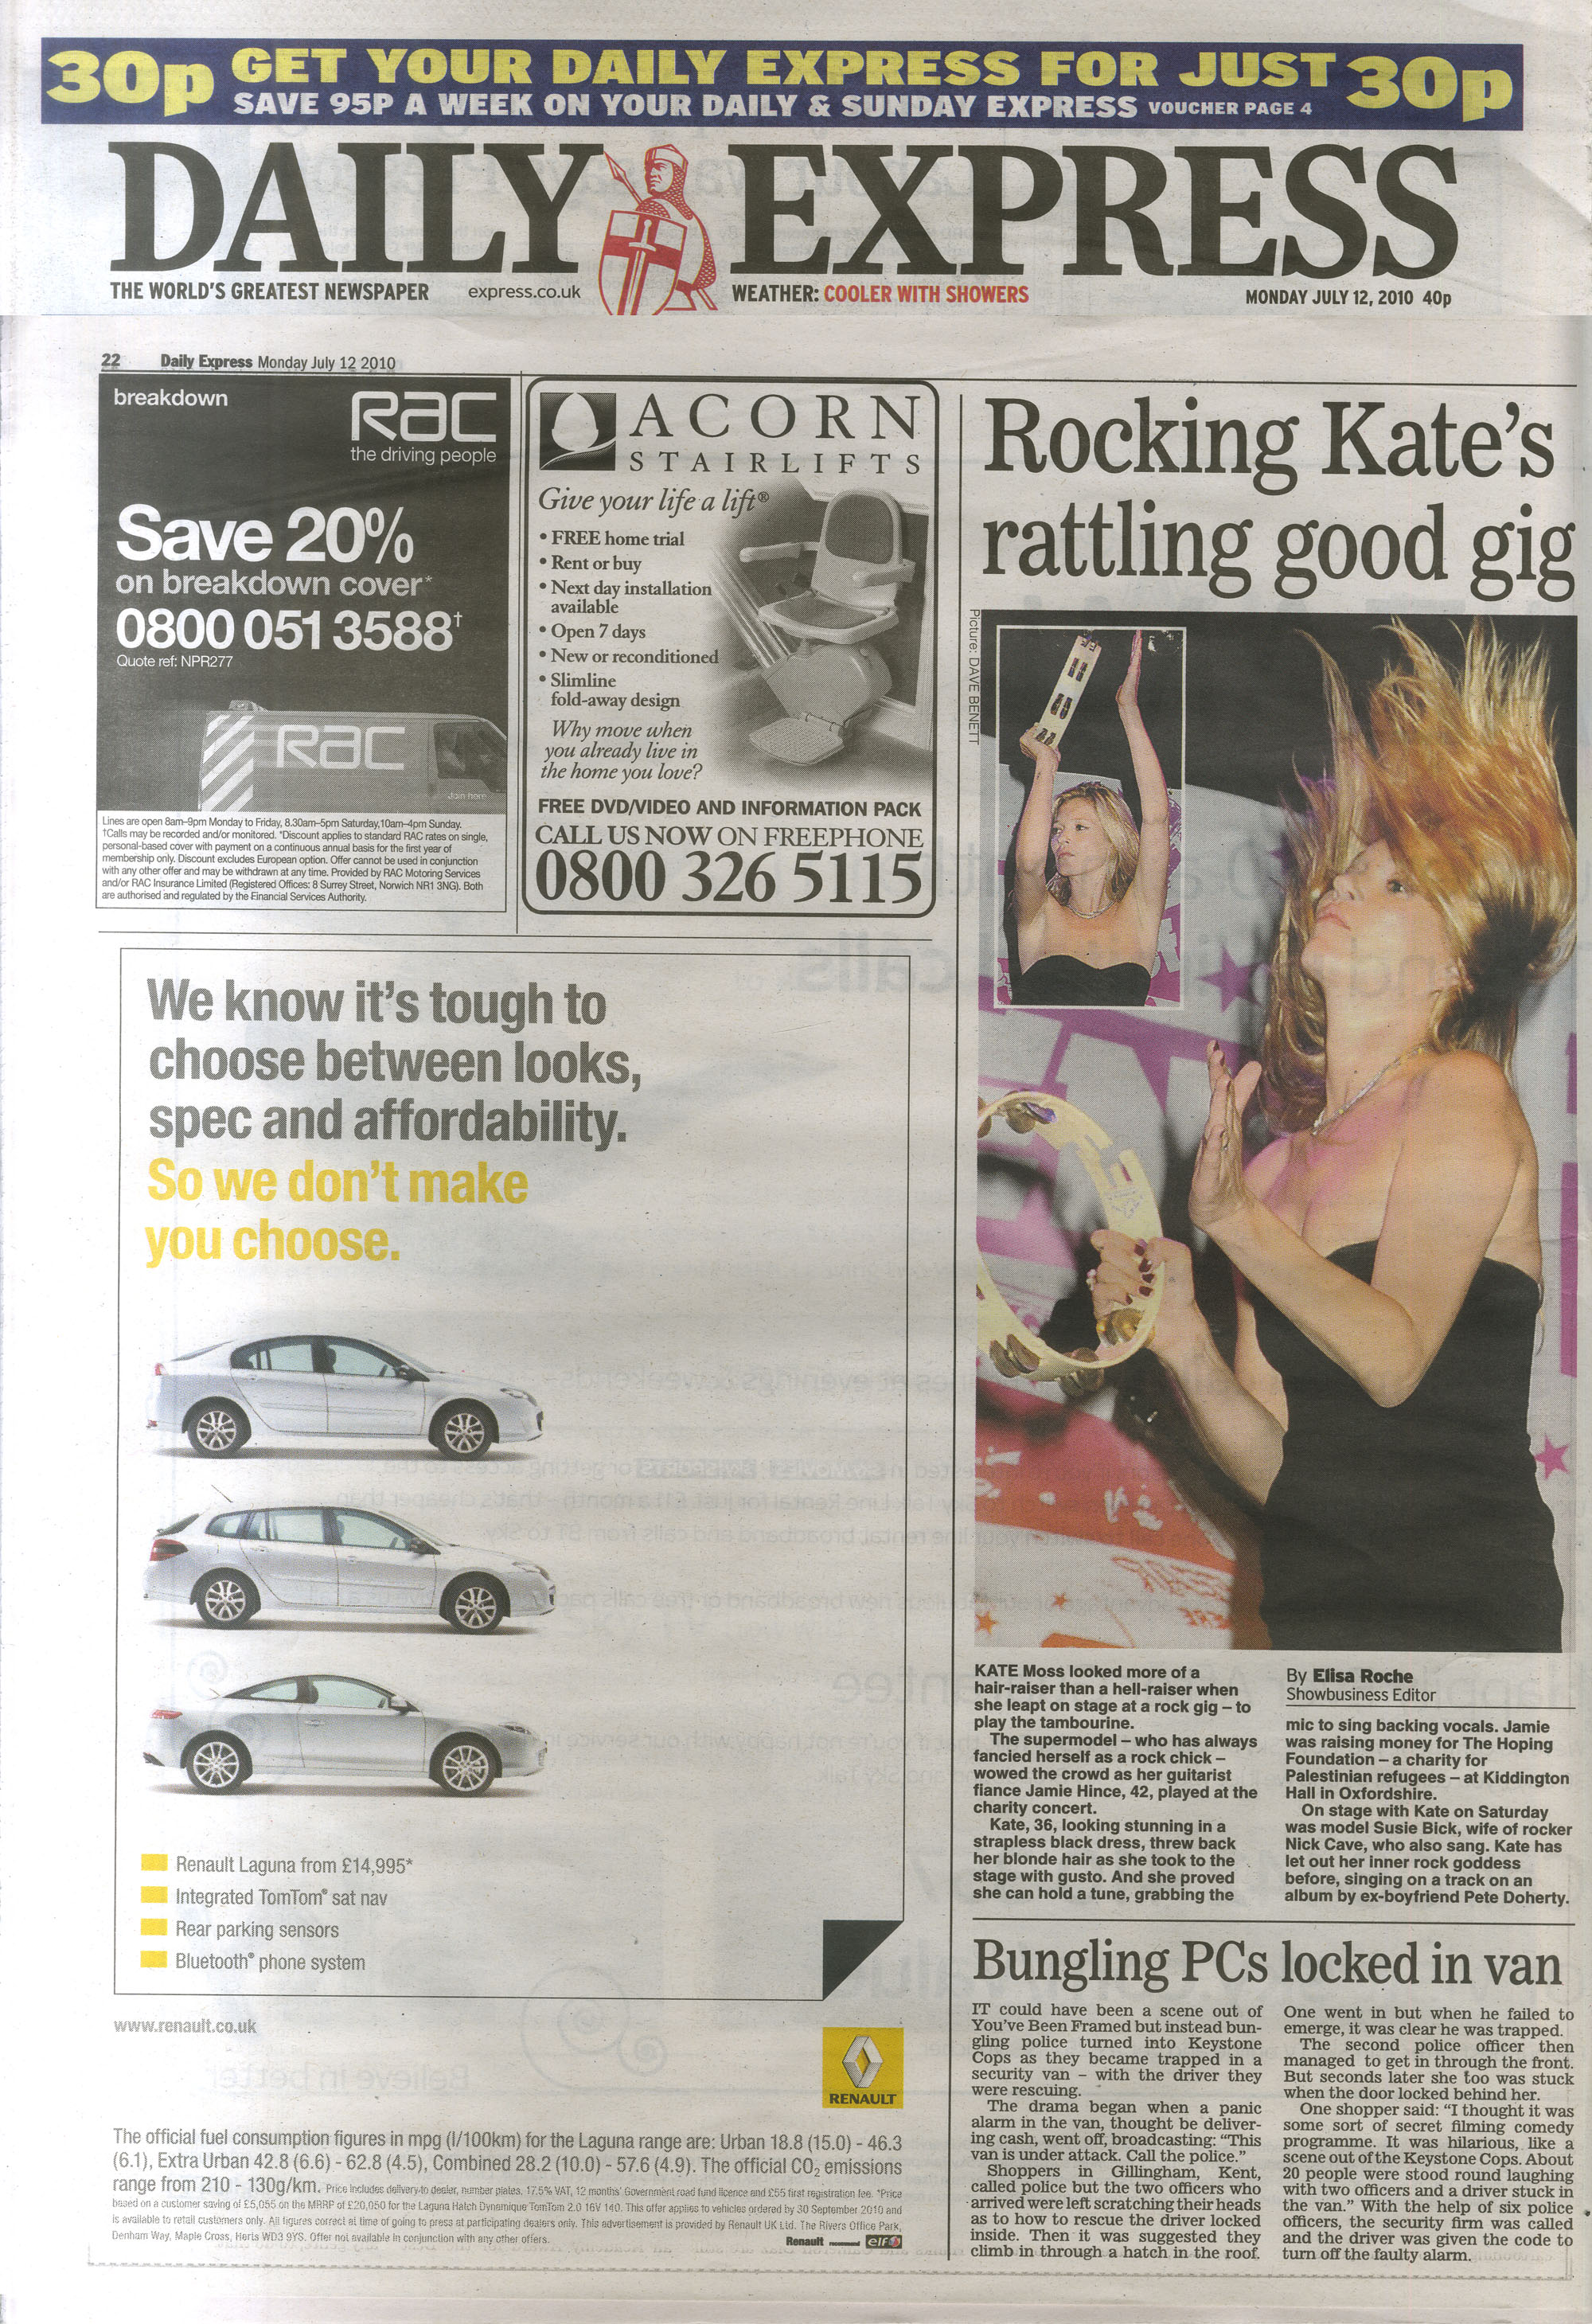 Daily Express editorial 12 July 2010 .jpg